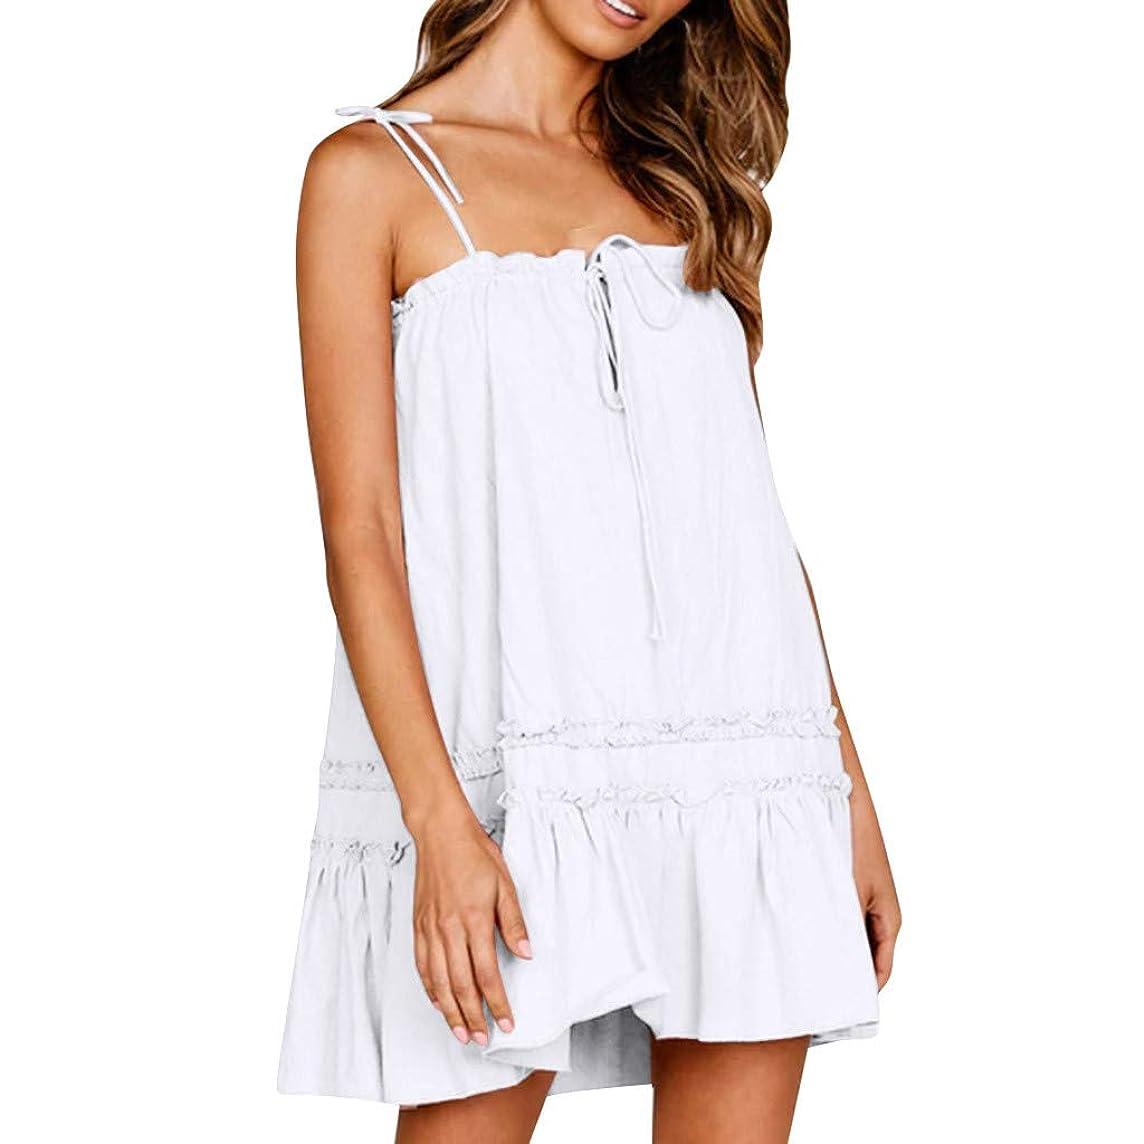 HAALIFE??Ruffle Dresses for Women Summer Spaghetti Strap Solid midi Dress Summer Backless Beach Short Dress